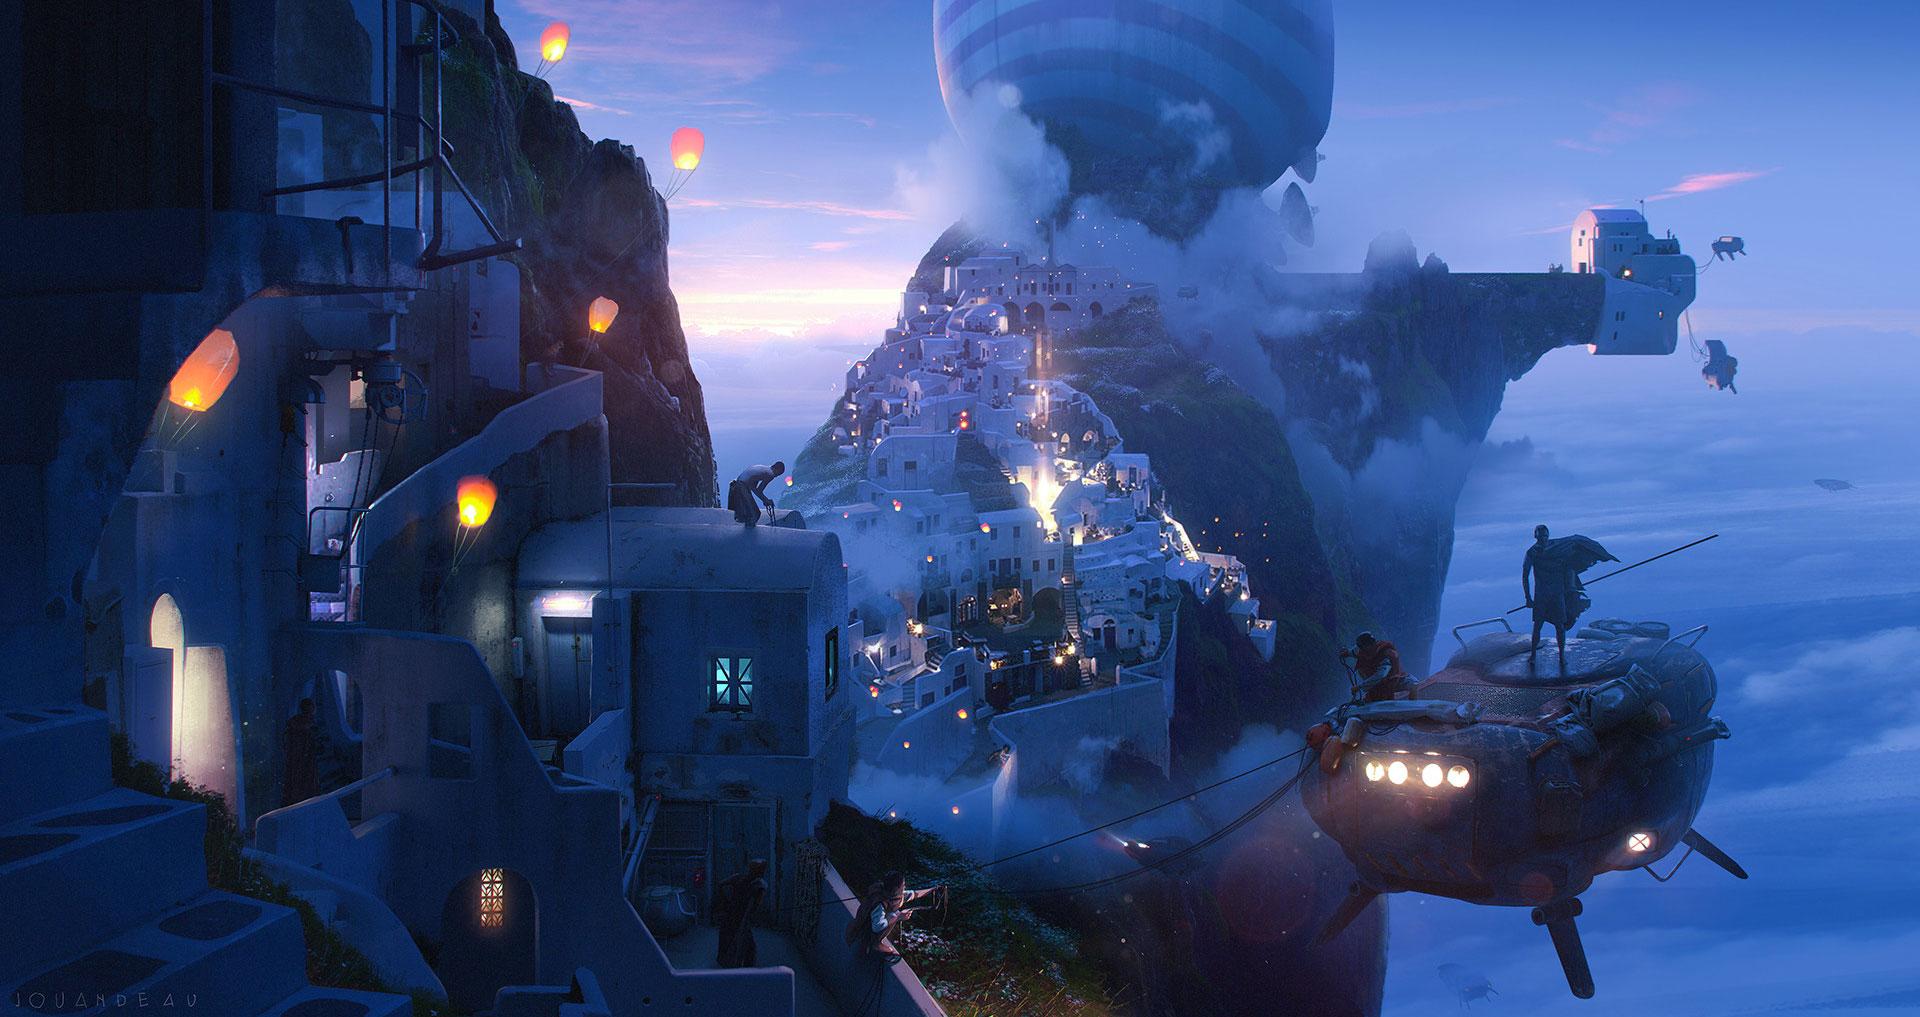 The Stunning Sci-Fi Artworks of Romain Jouandeau